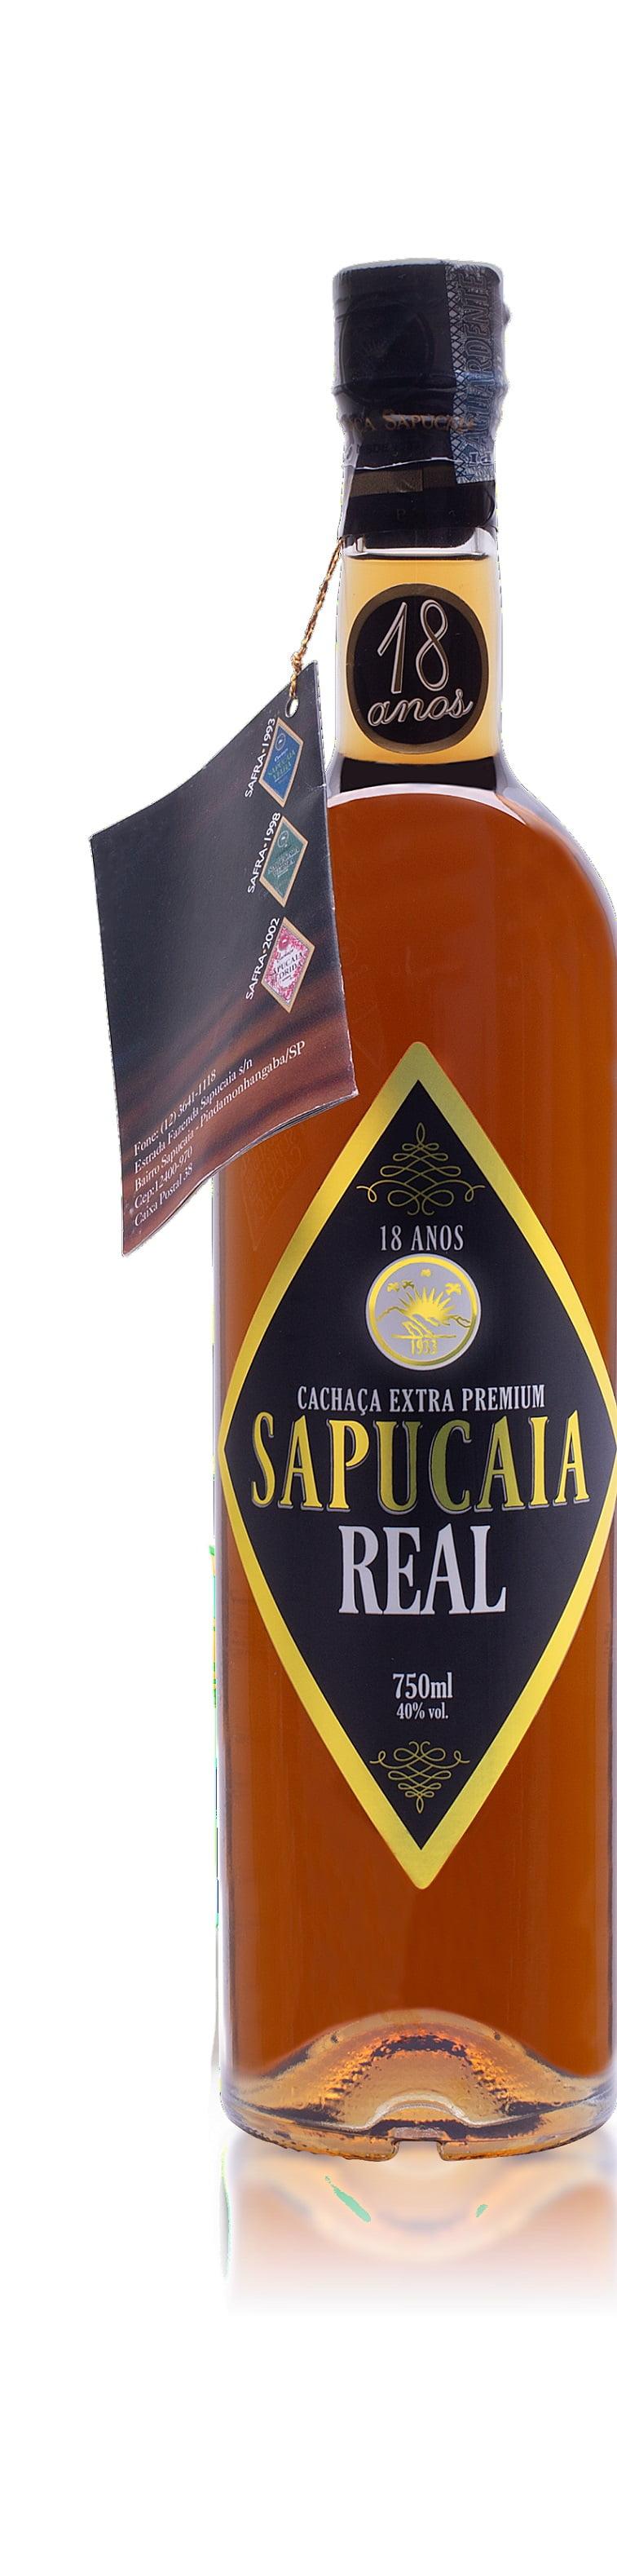 Cachaça Sapucaia Real Extra Premium 750 ml